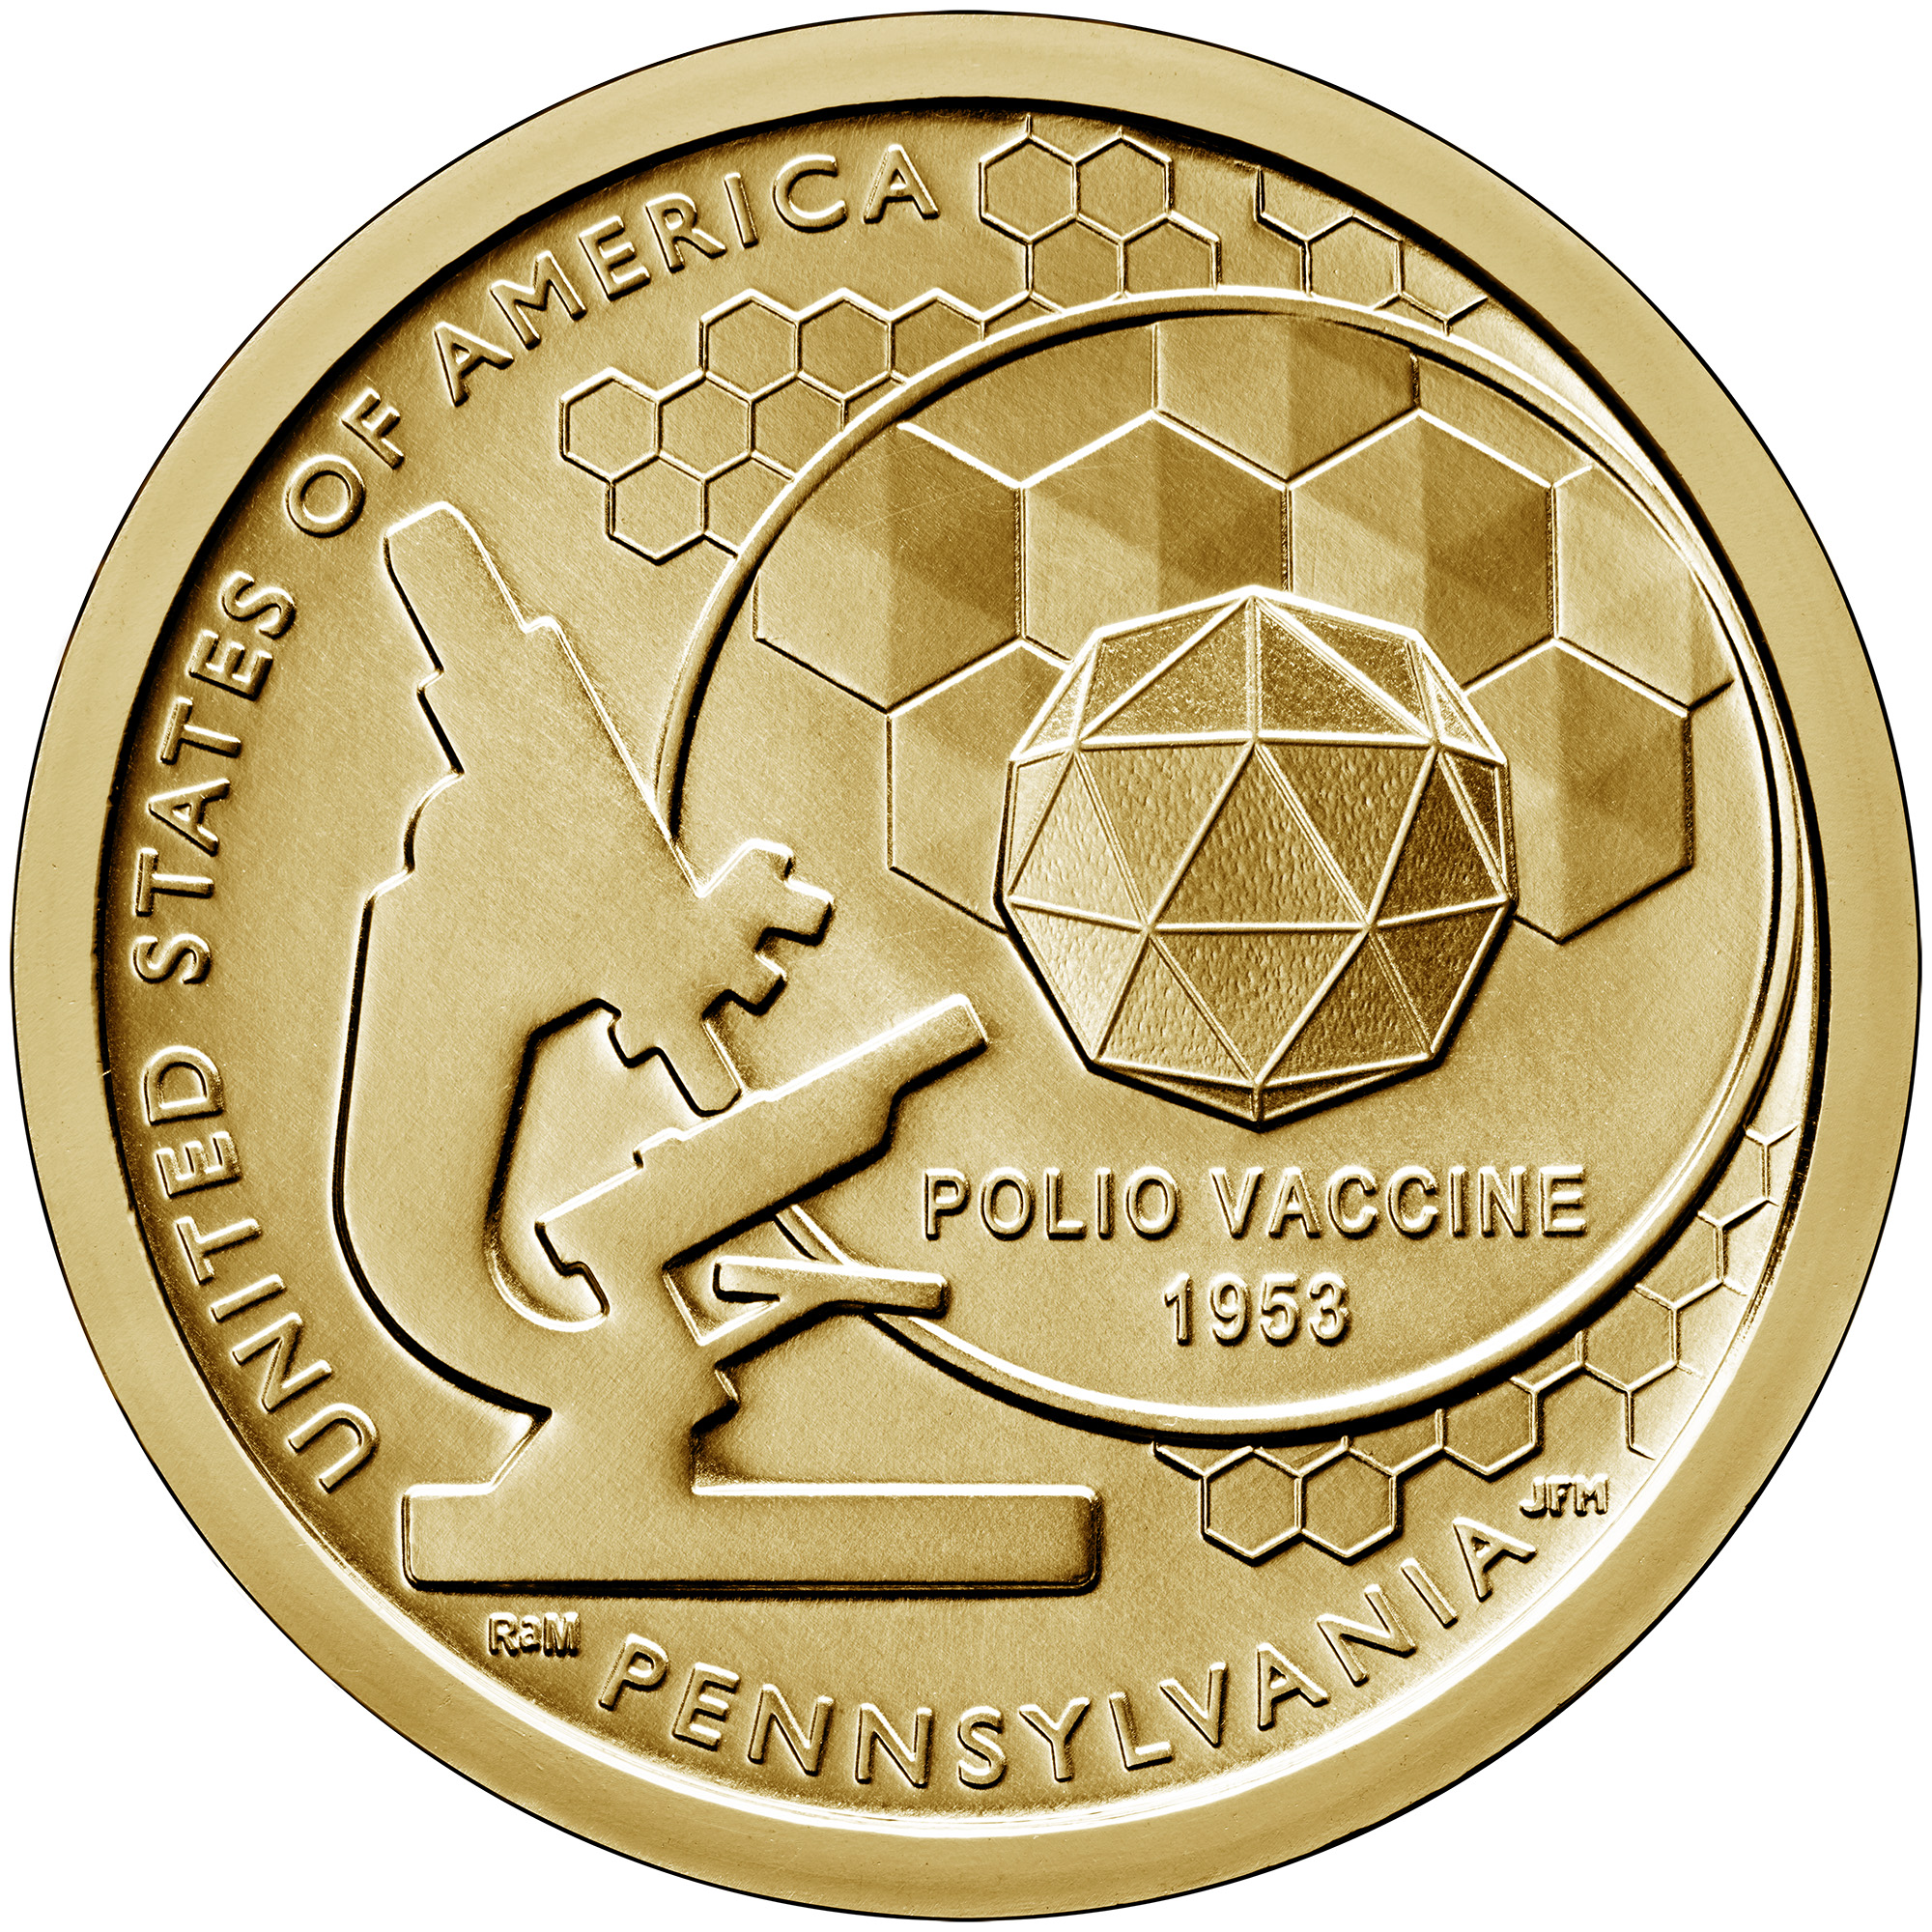 2019 American Innovation One Dollar Coin Pennsylvania Uncirculated Reverse